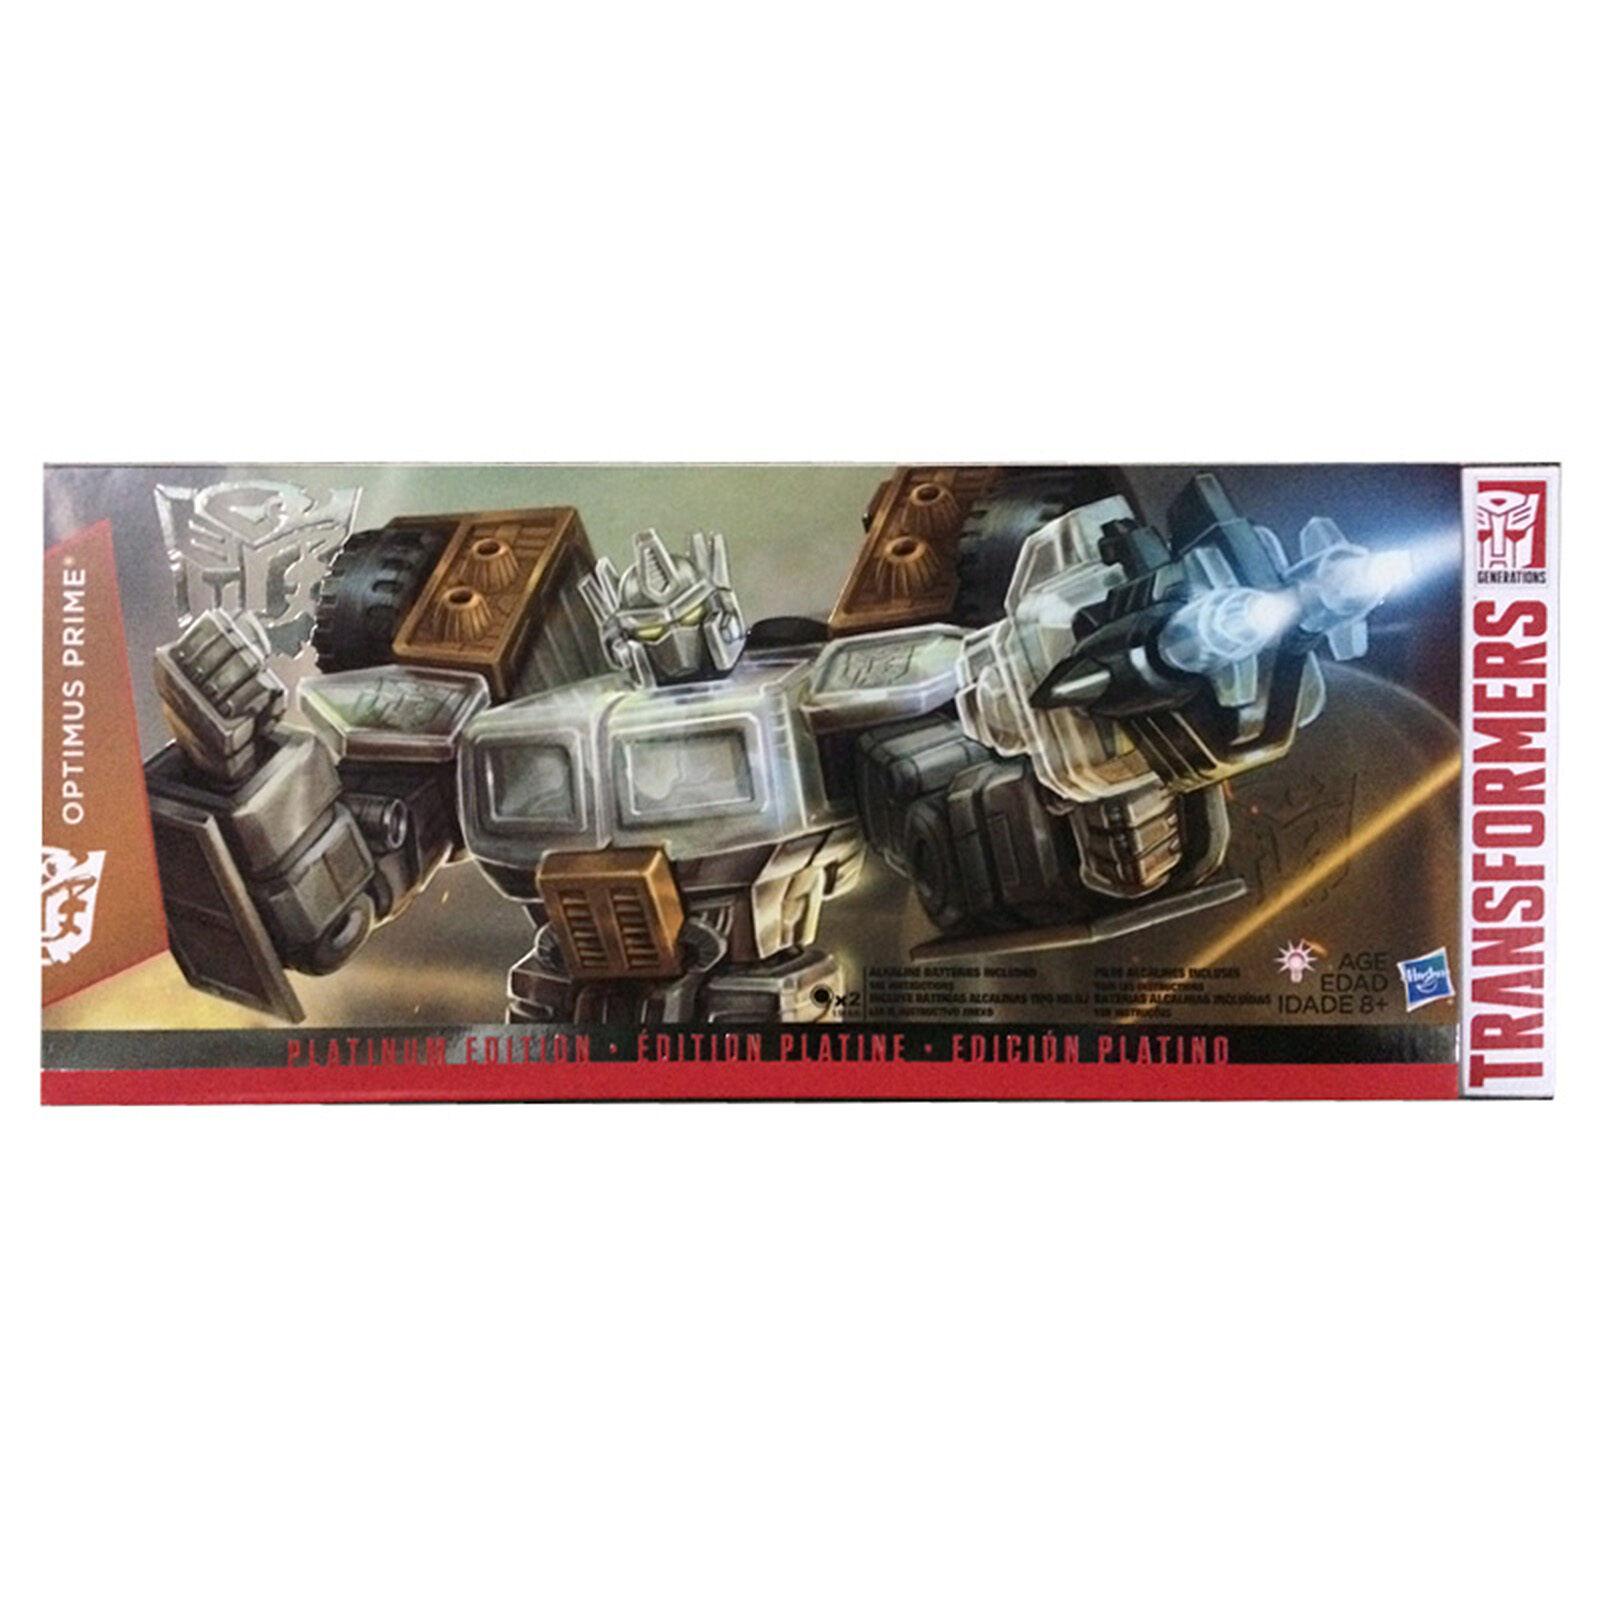 Transformers Collection  Platinum Edition G2 Laser Optimus Prime Gift